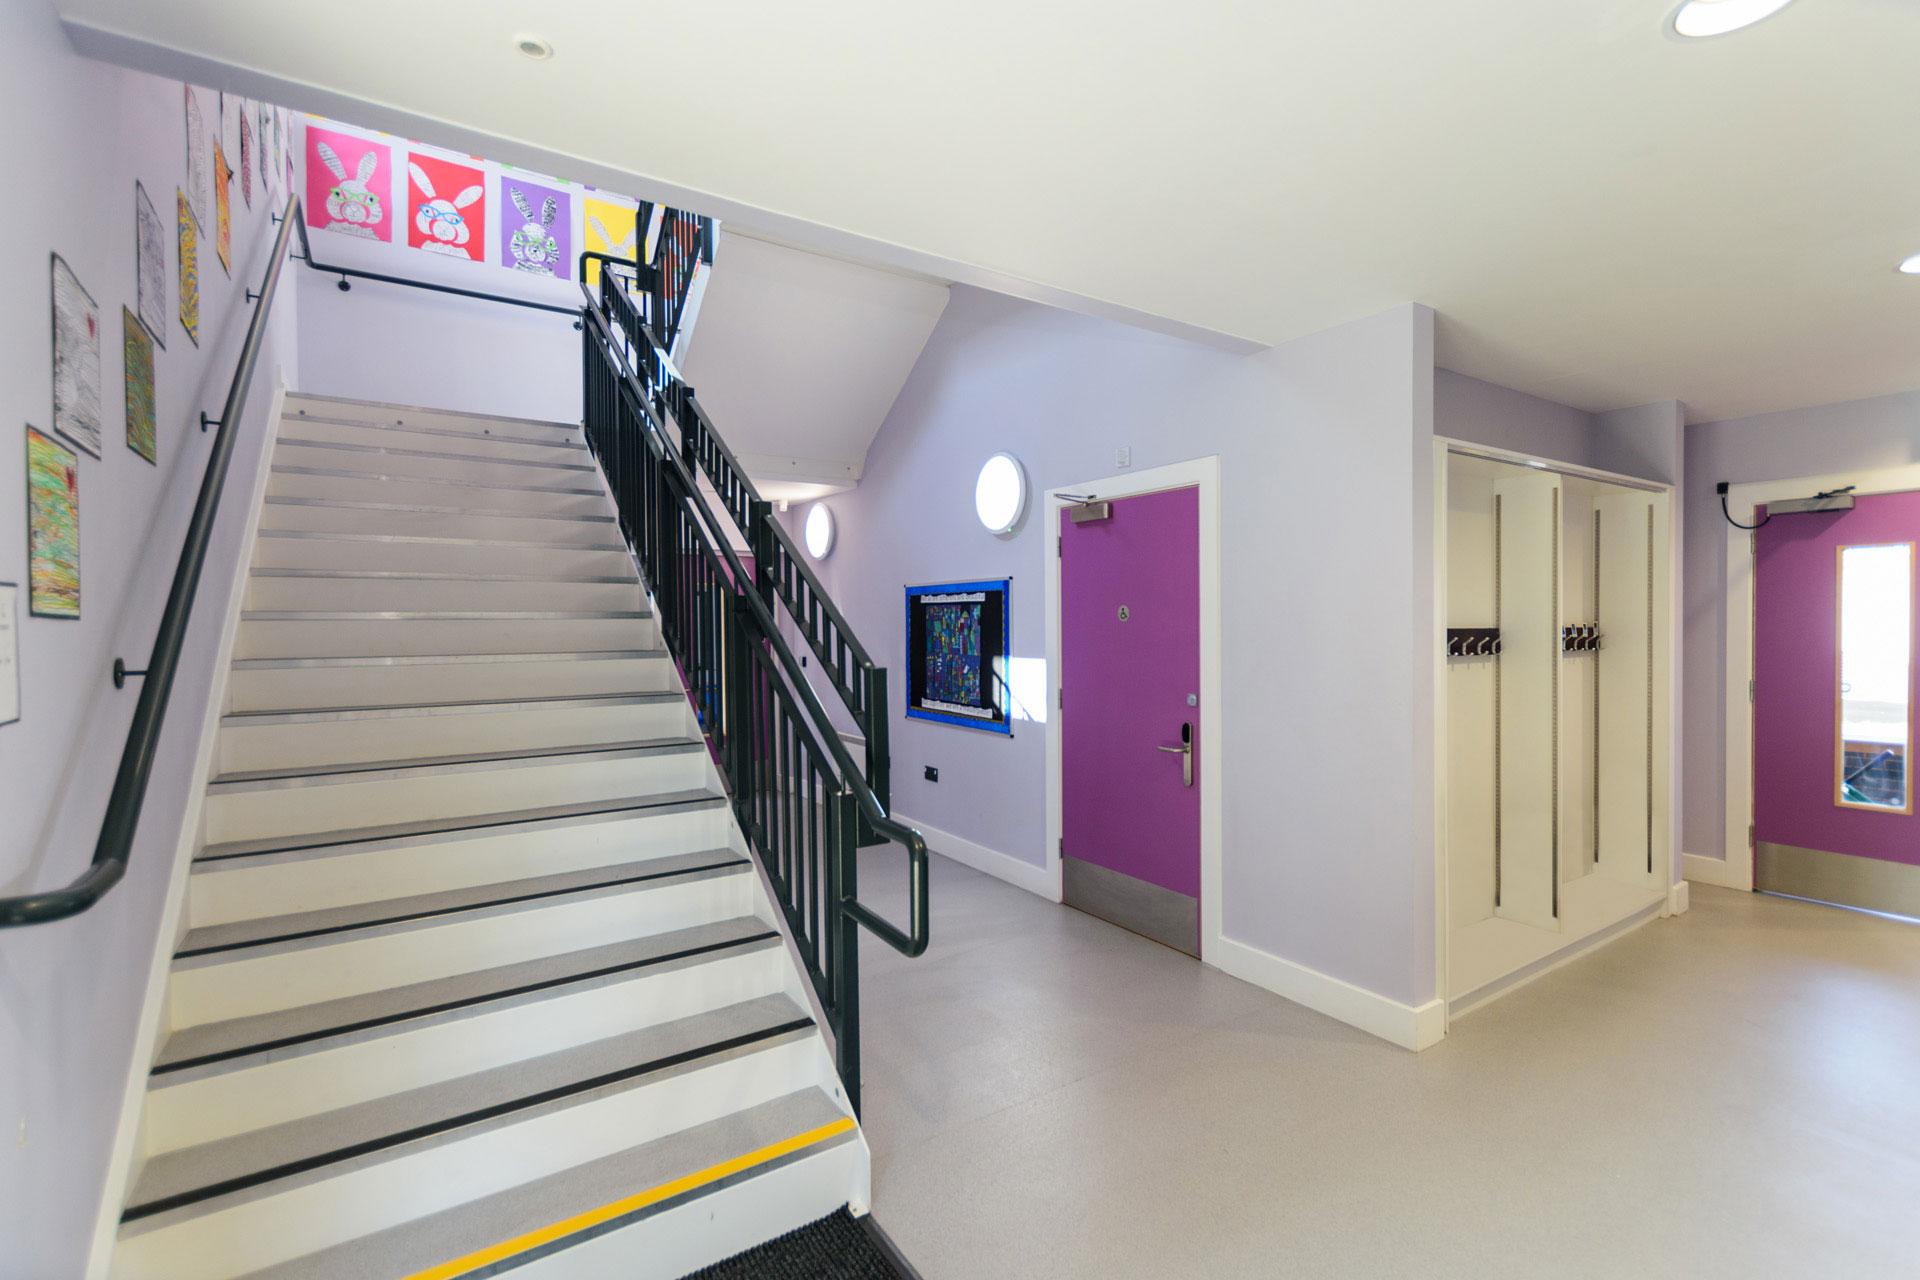 Drumbet School and ASD 6th Form teaching - Modular SEN building internal DDA stairway and corridor